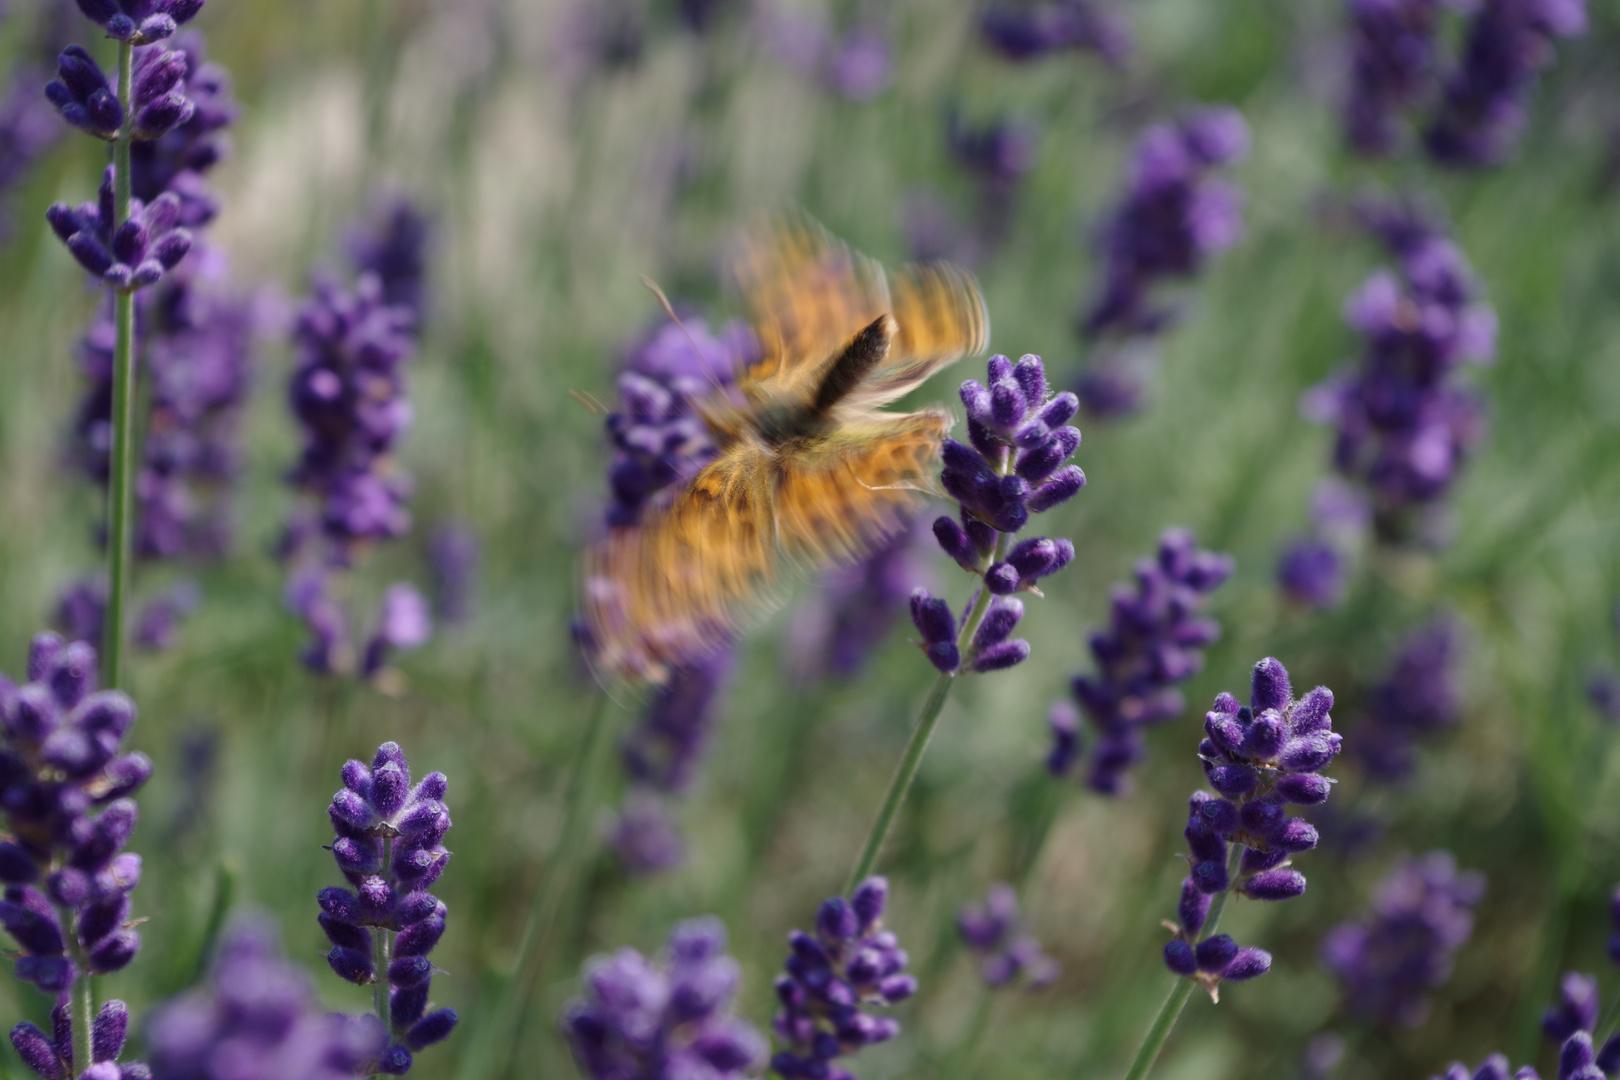 Perlmutterfalter an Lavendel